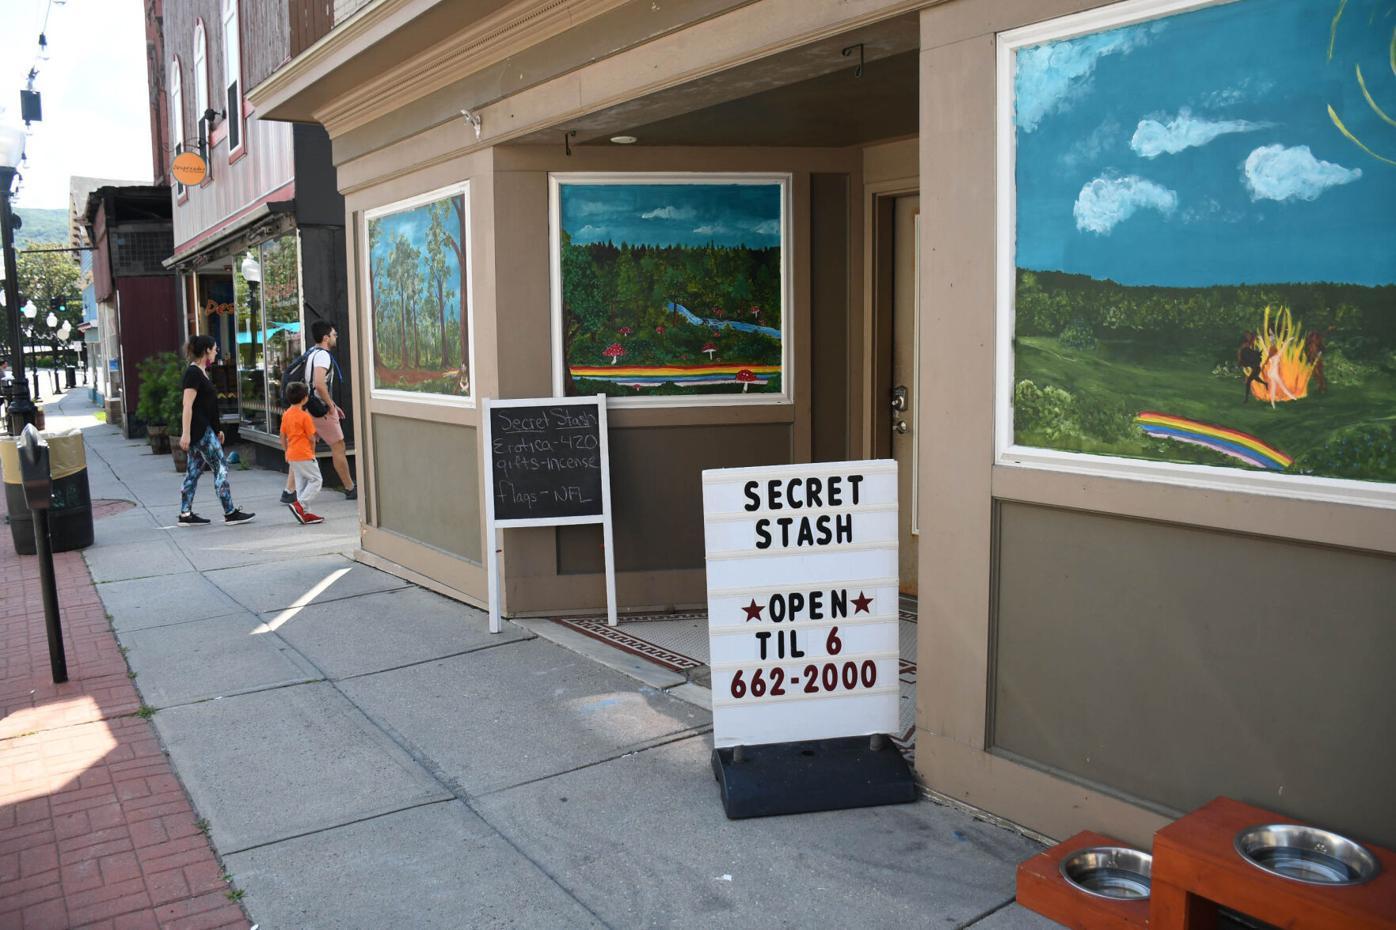 The outside view of Secret Stash